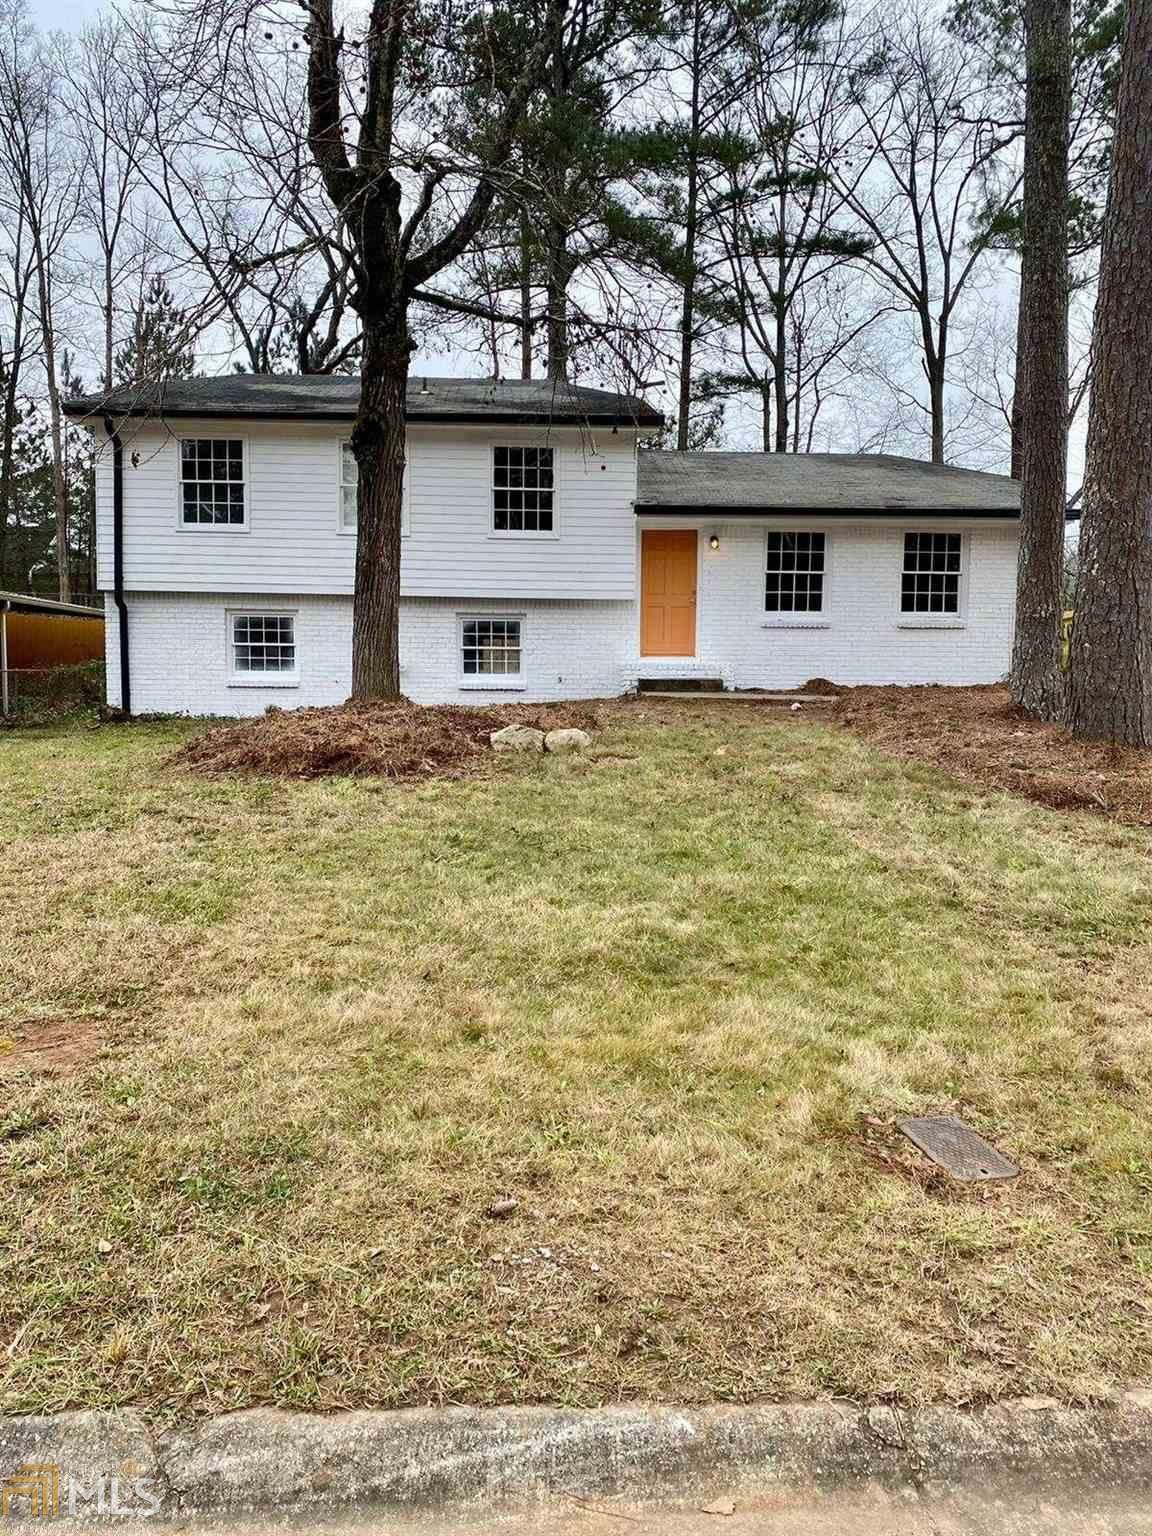 8391 Magnolia Dr, Jonesboro, GA 30238 - #: 8908207